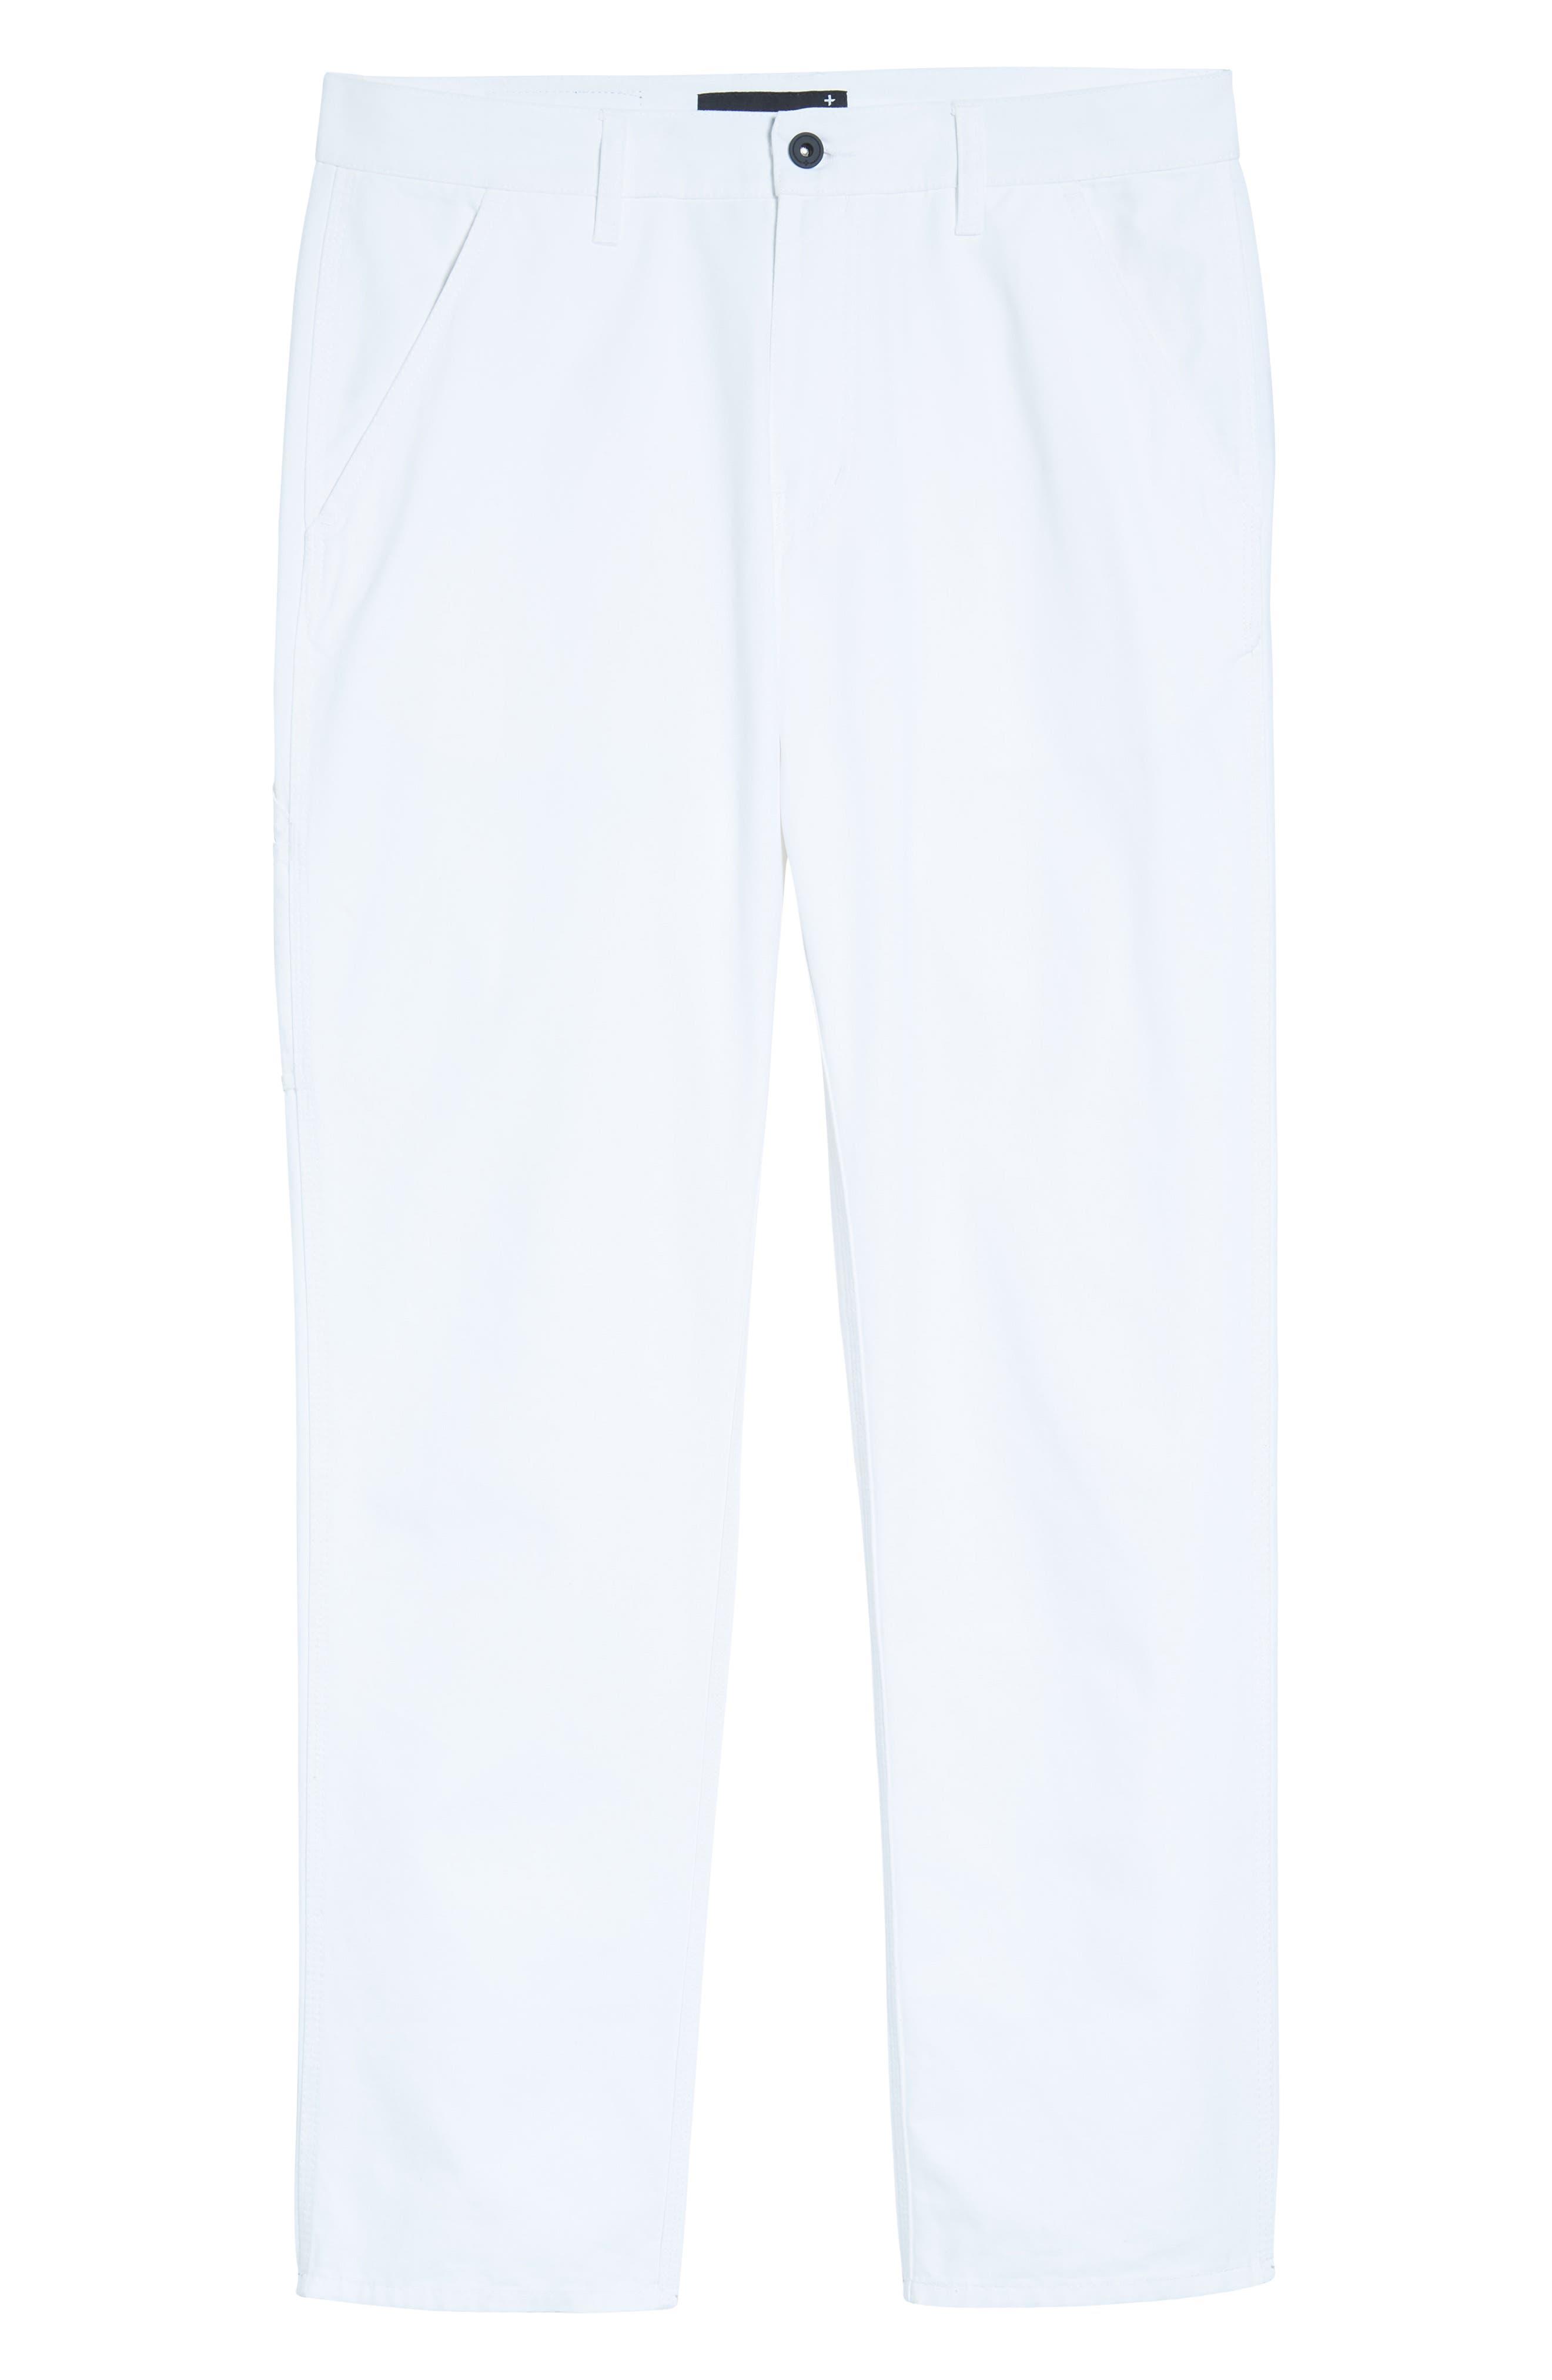 Westport Utility Pants,                             Main thumbnail 1, color,                             White